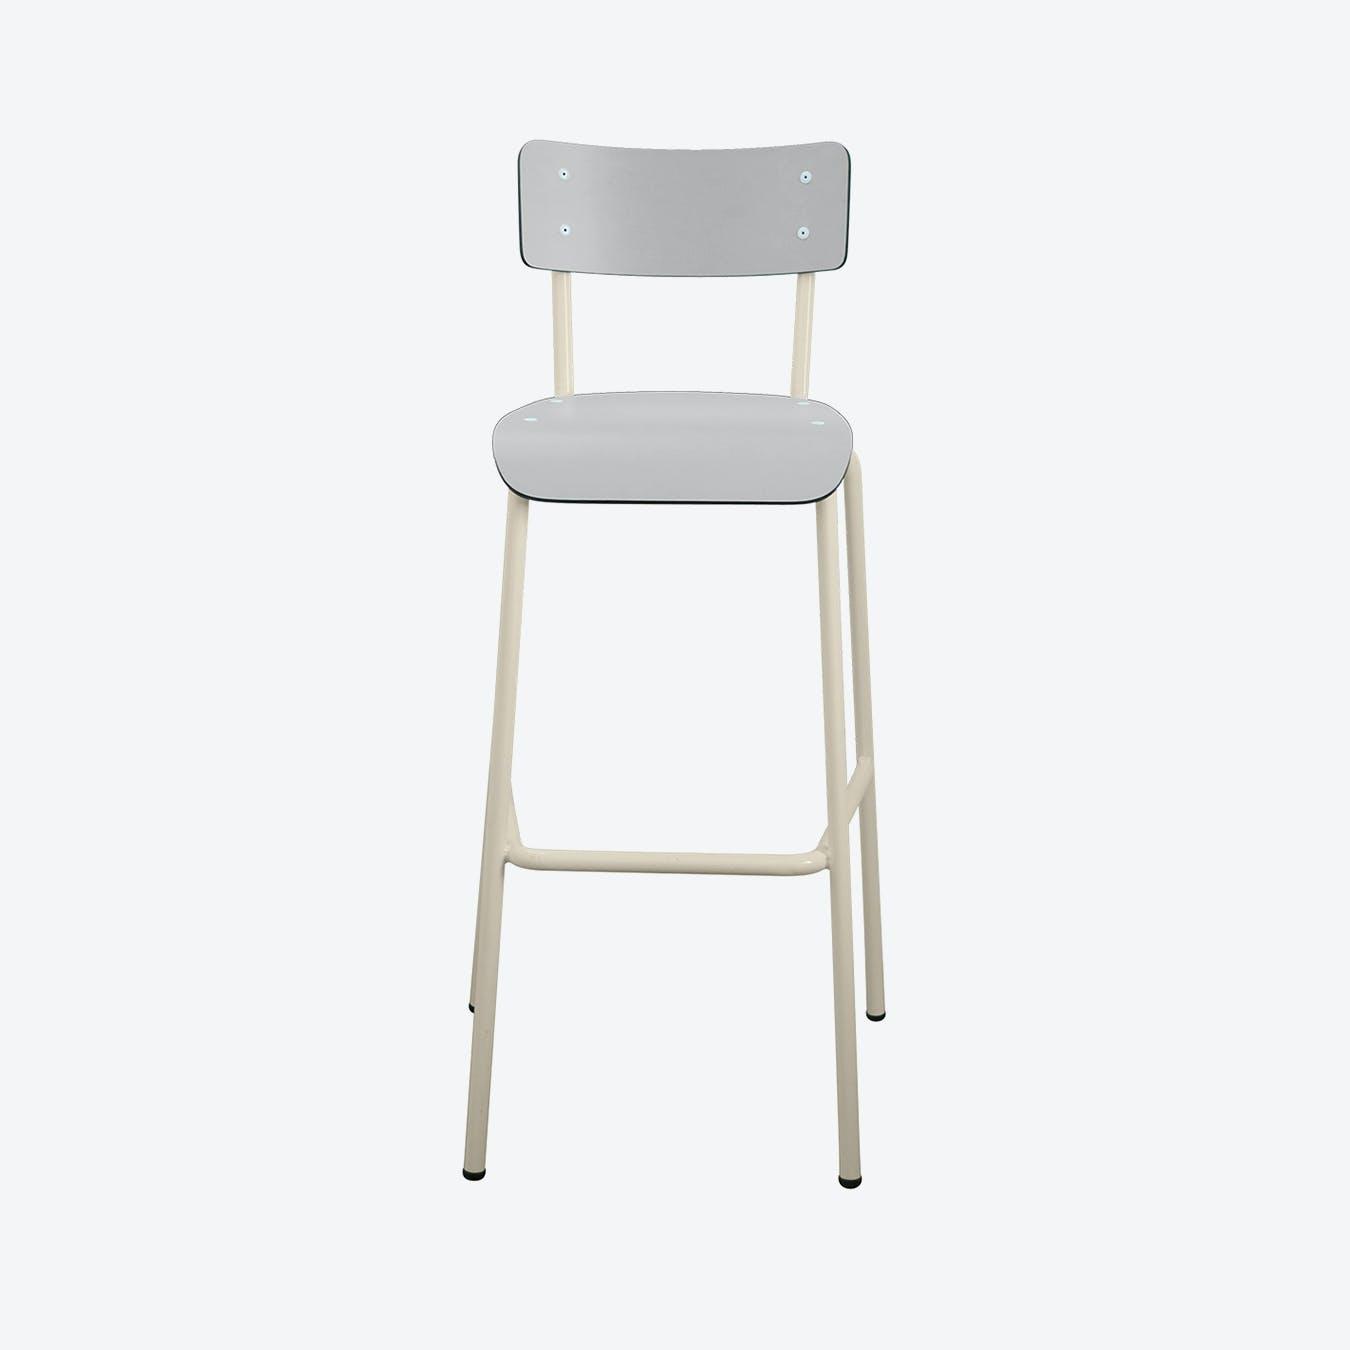 Suzie 75cm High Chair - Light Grey